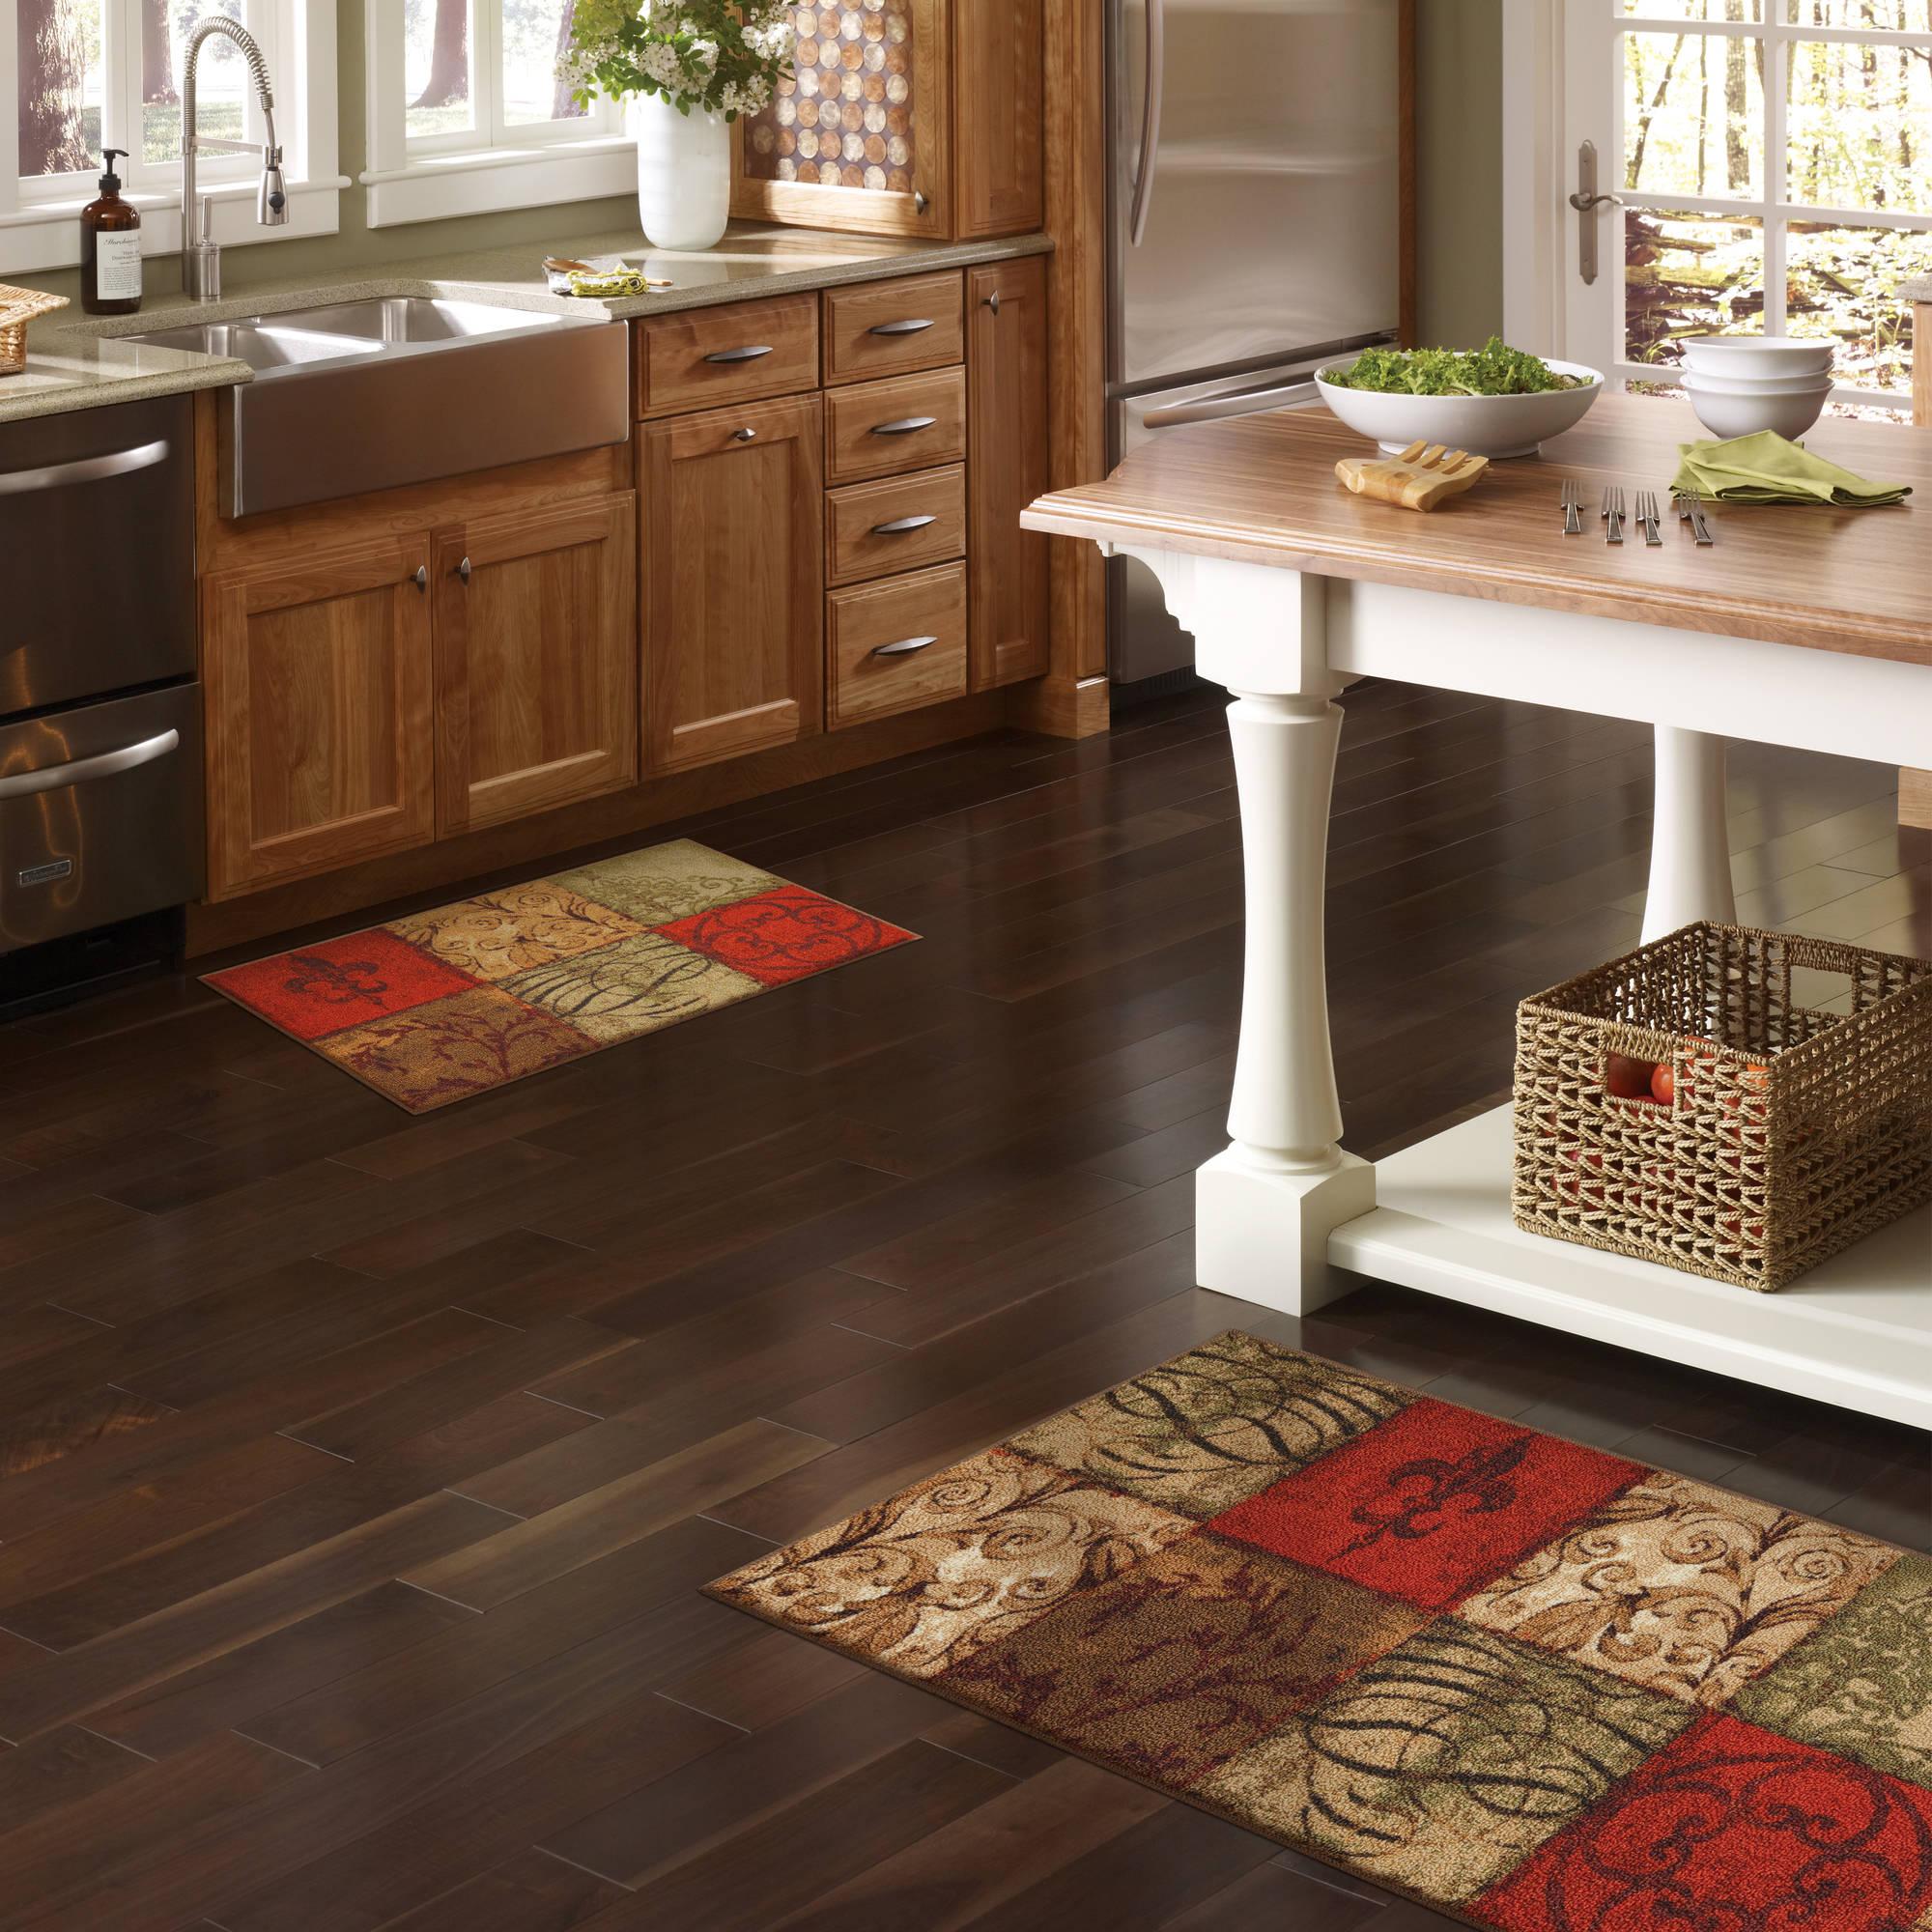 mohawk home tuscany kitchen rug - walmart.com TSIWJRR